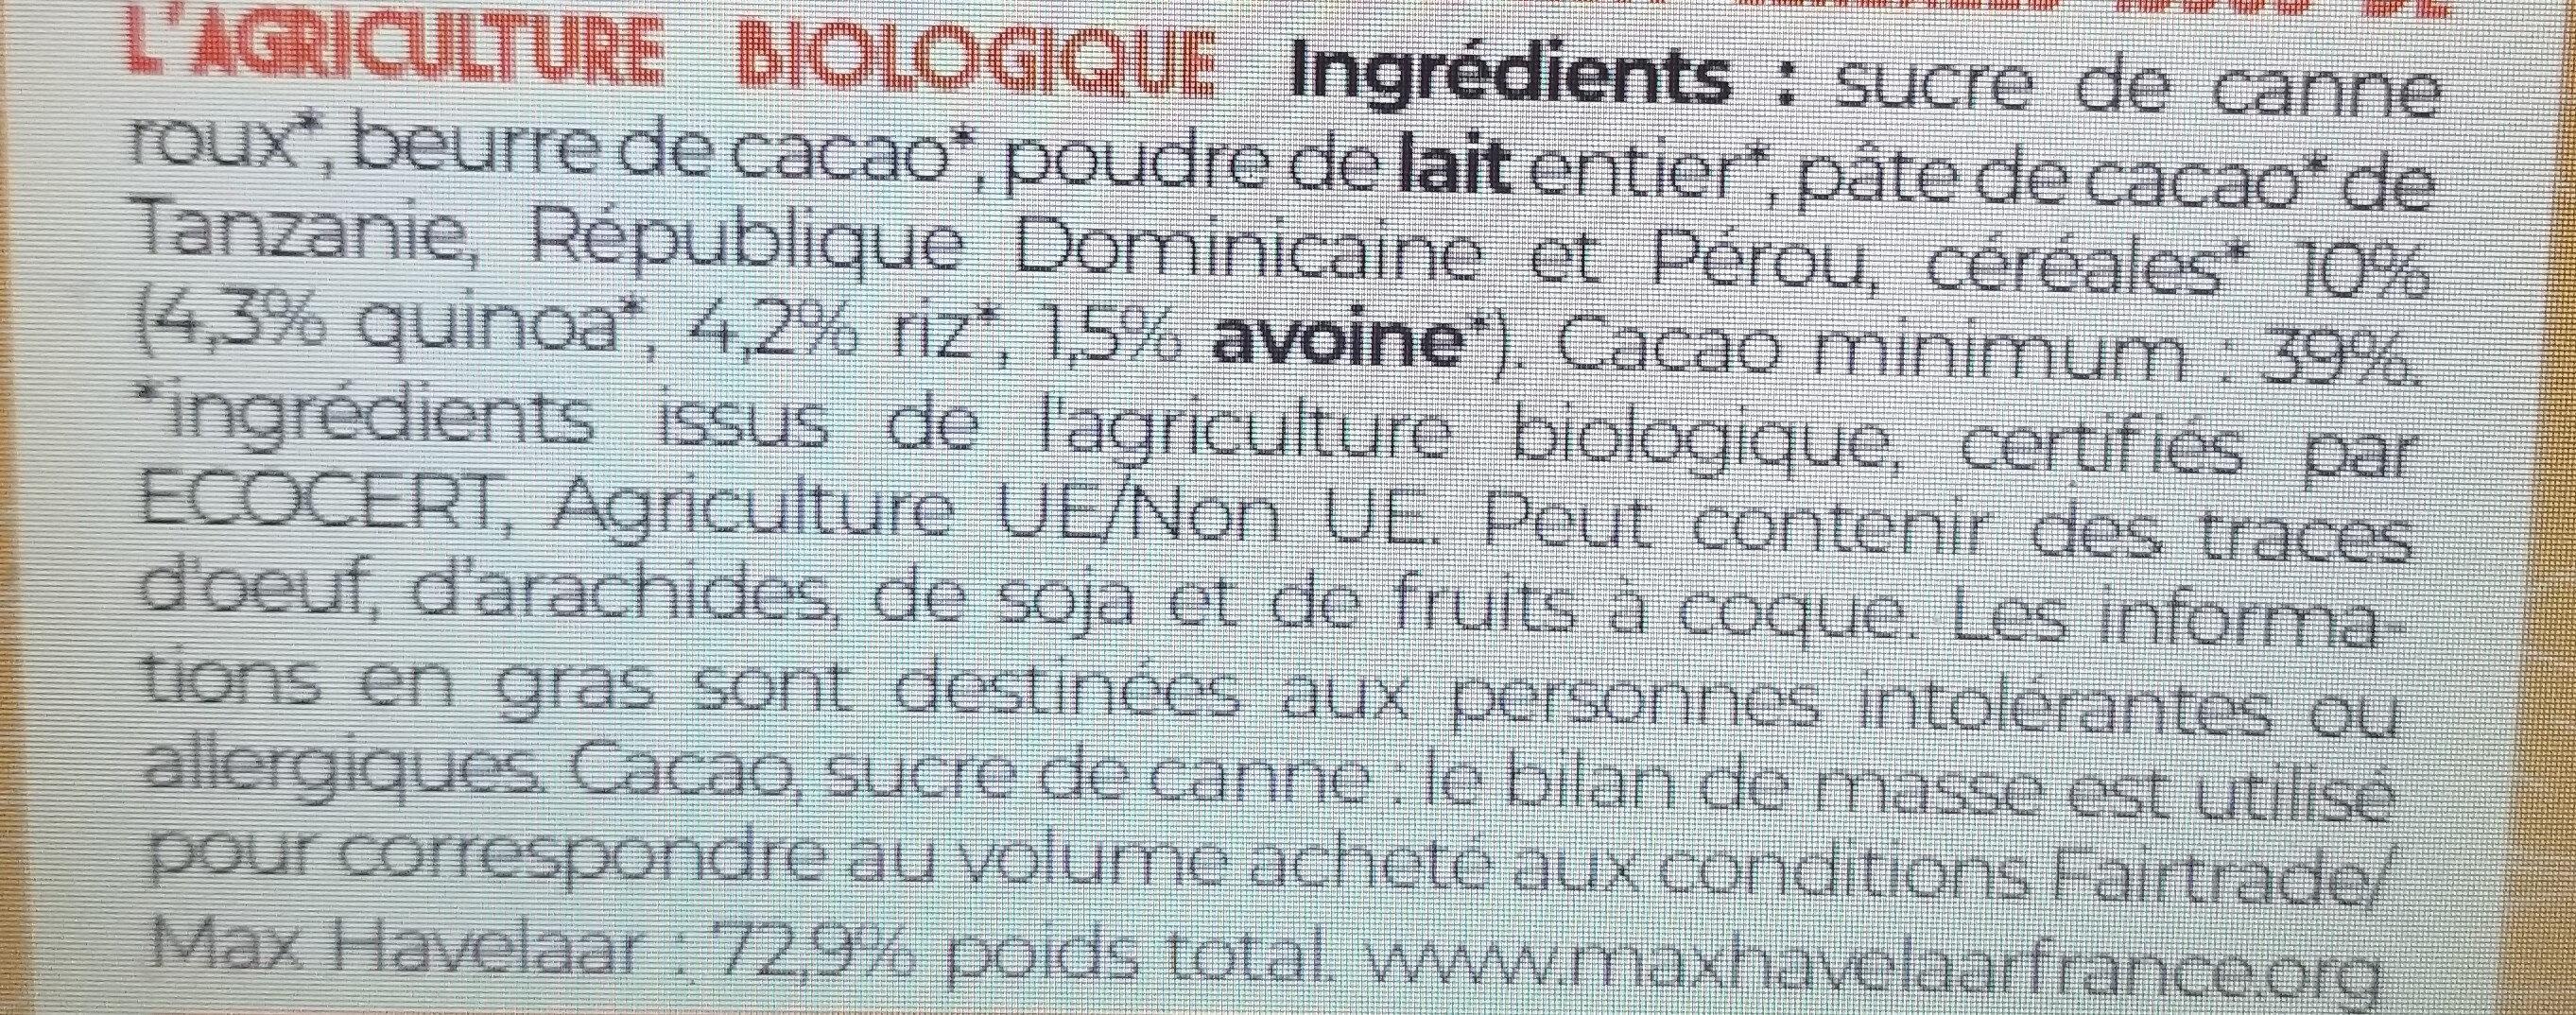 Chocolat au lait et aux cereales bio et equitable 100g - Ingredienti - fr